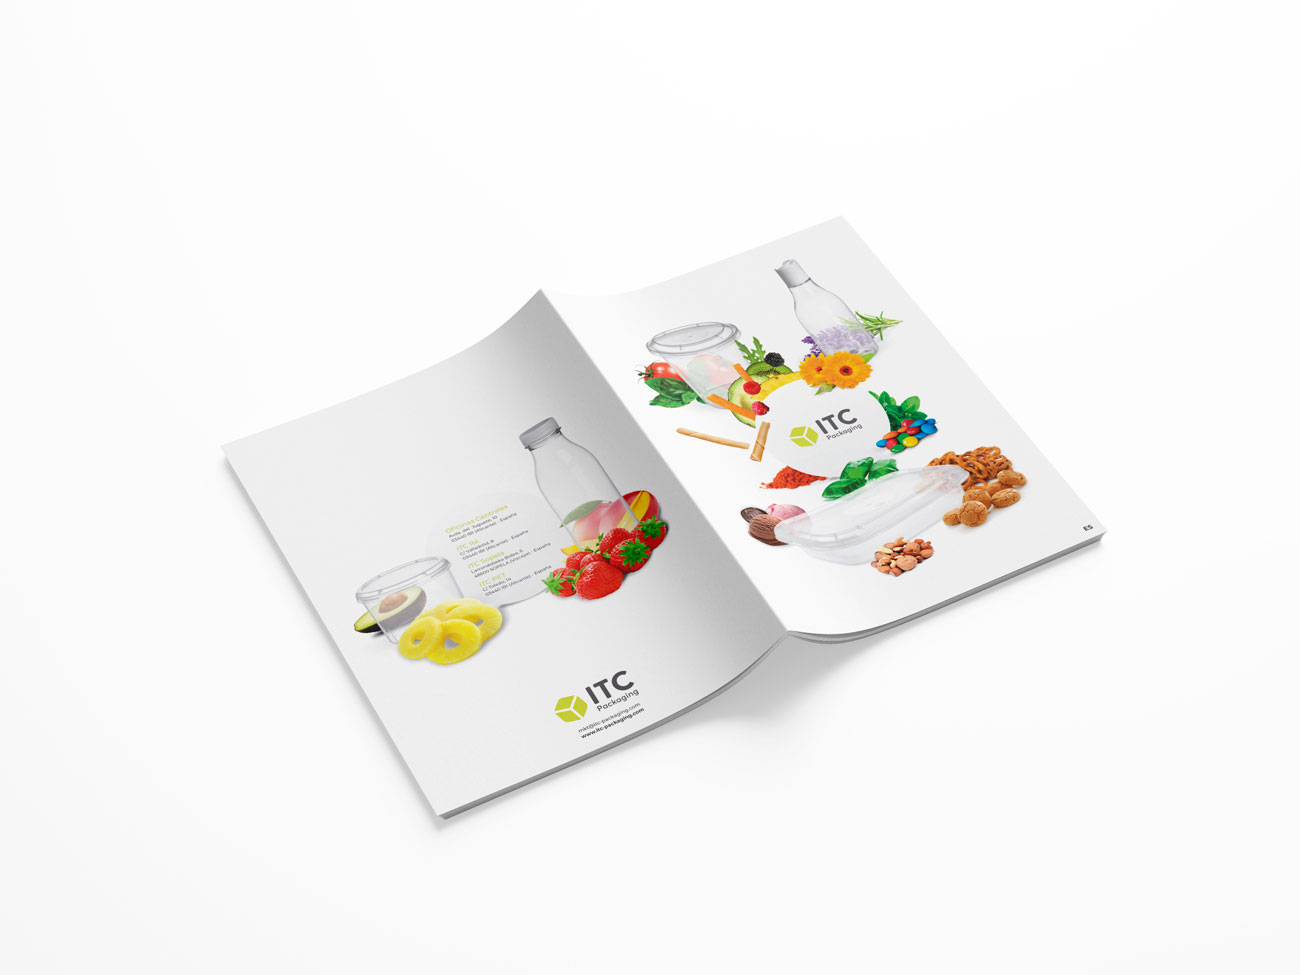 ugedafita ITC catalogo6